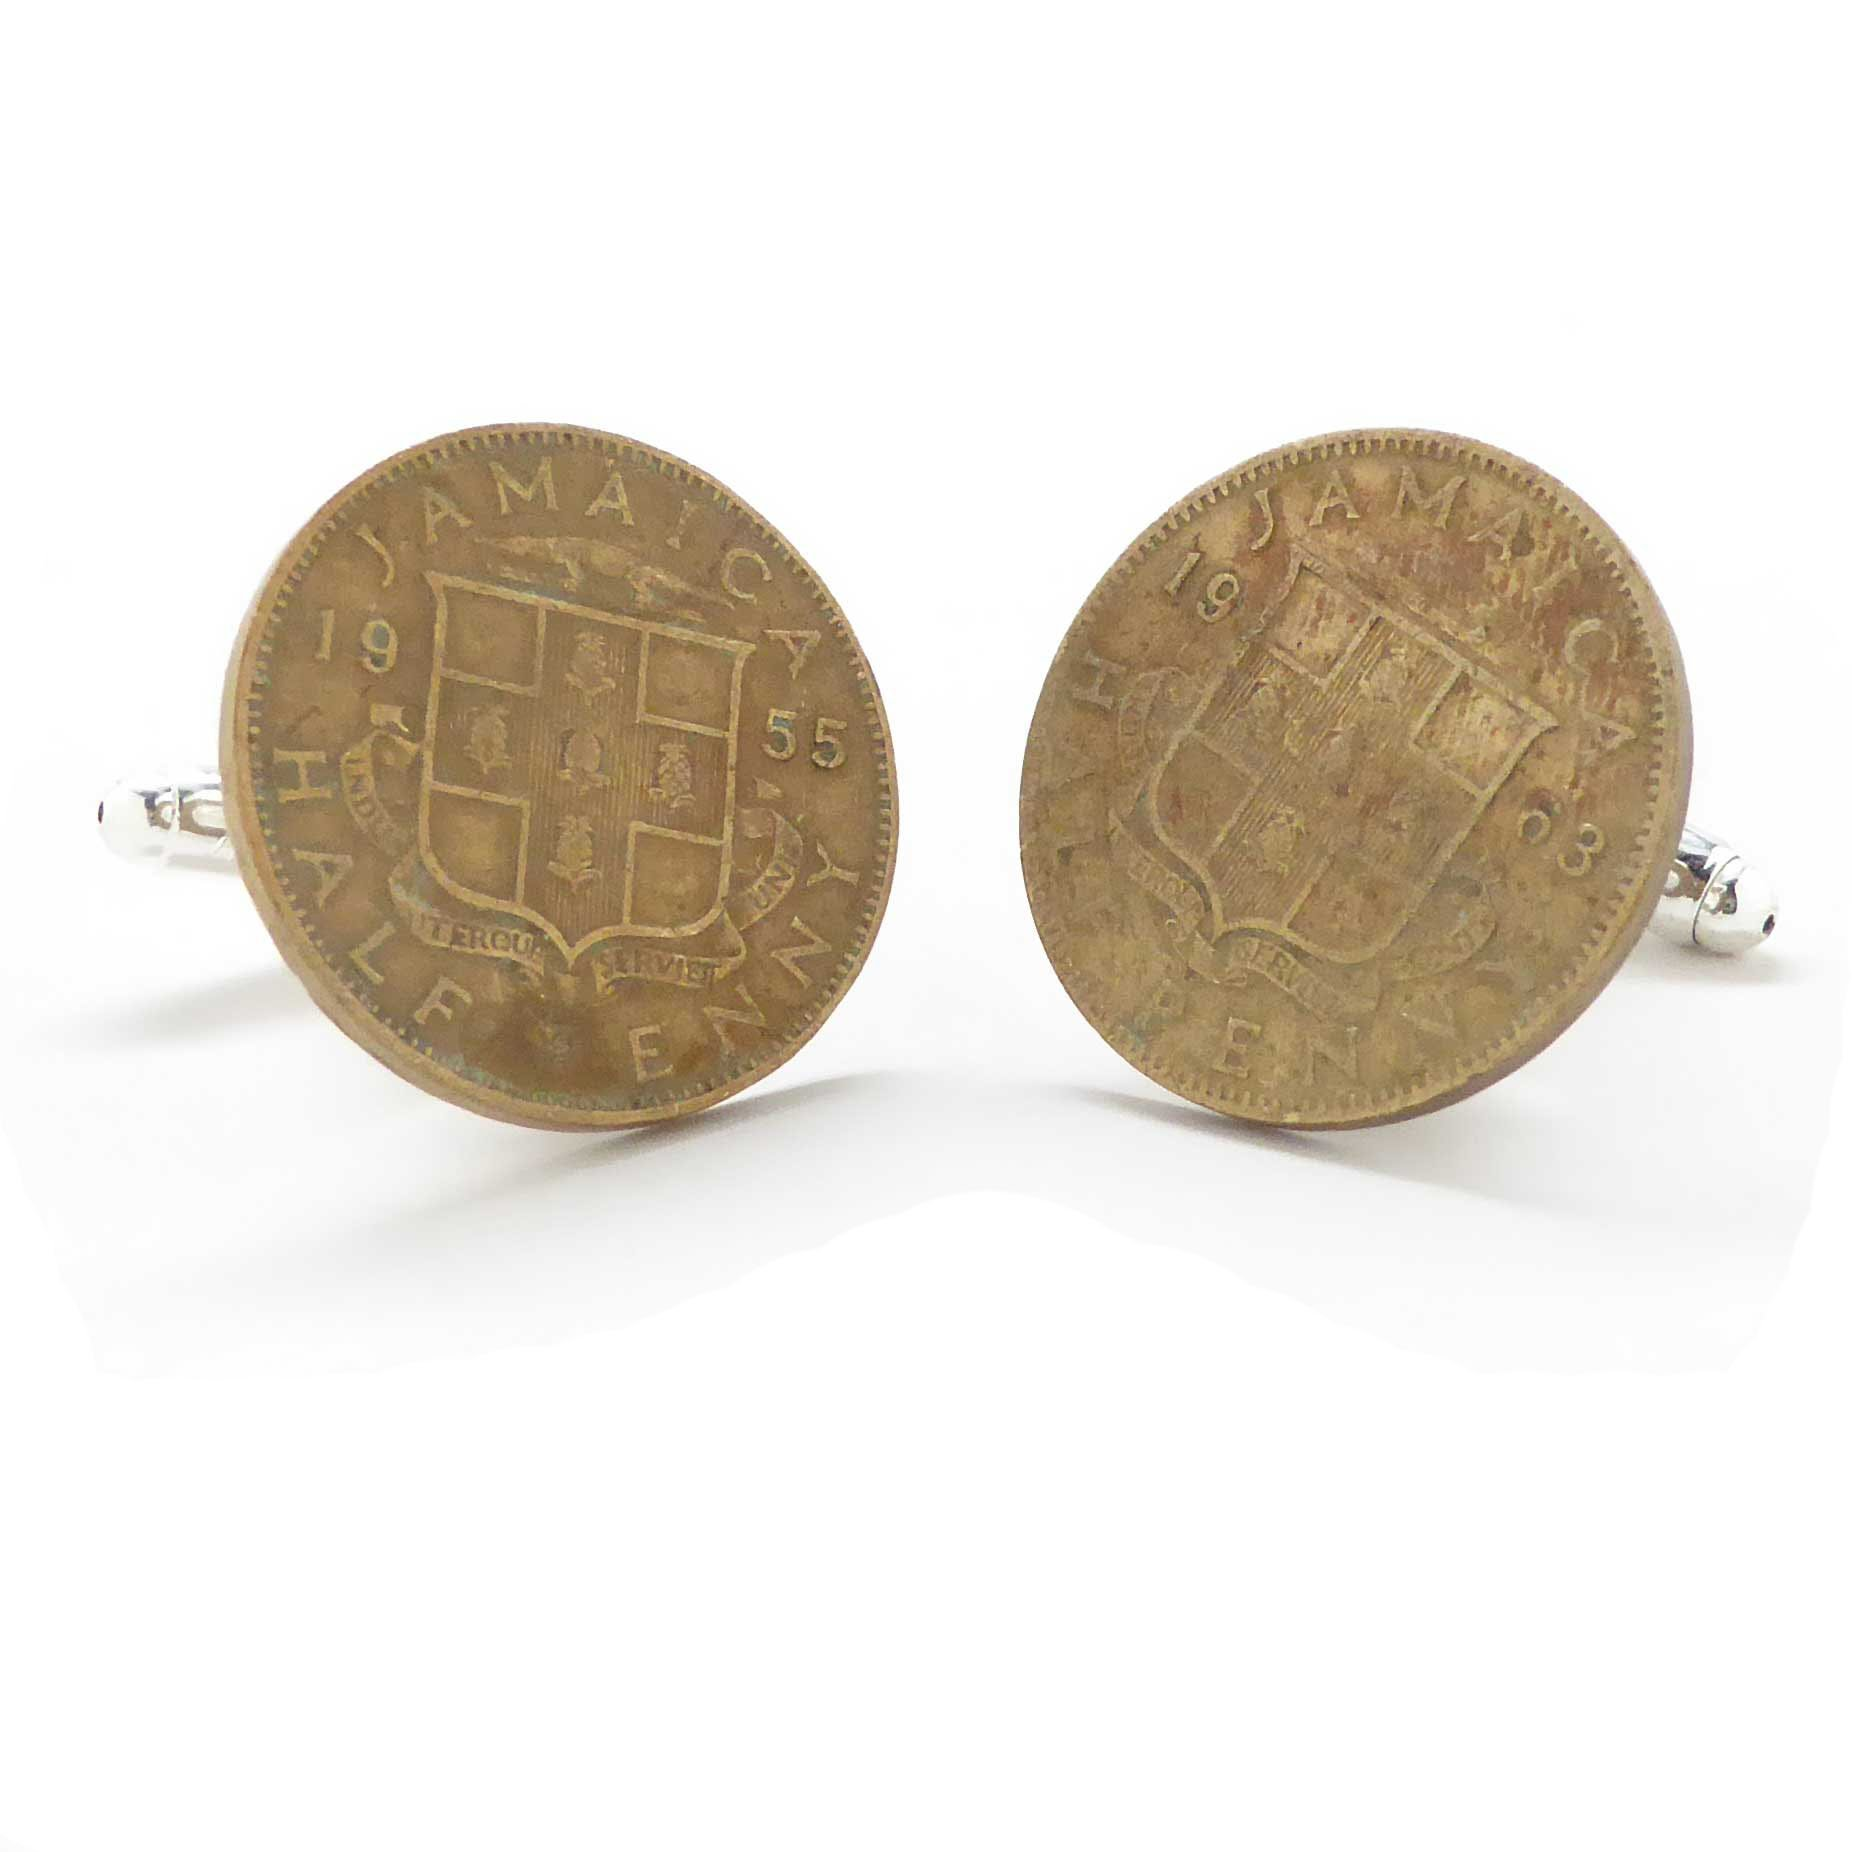 Jamaica Coin Cufflinks Cuff Links Souvenir Jewelry Caribbean Kingston Port Royal Montego Bay Kingston